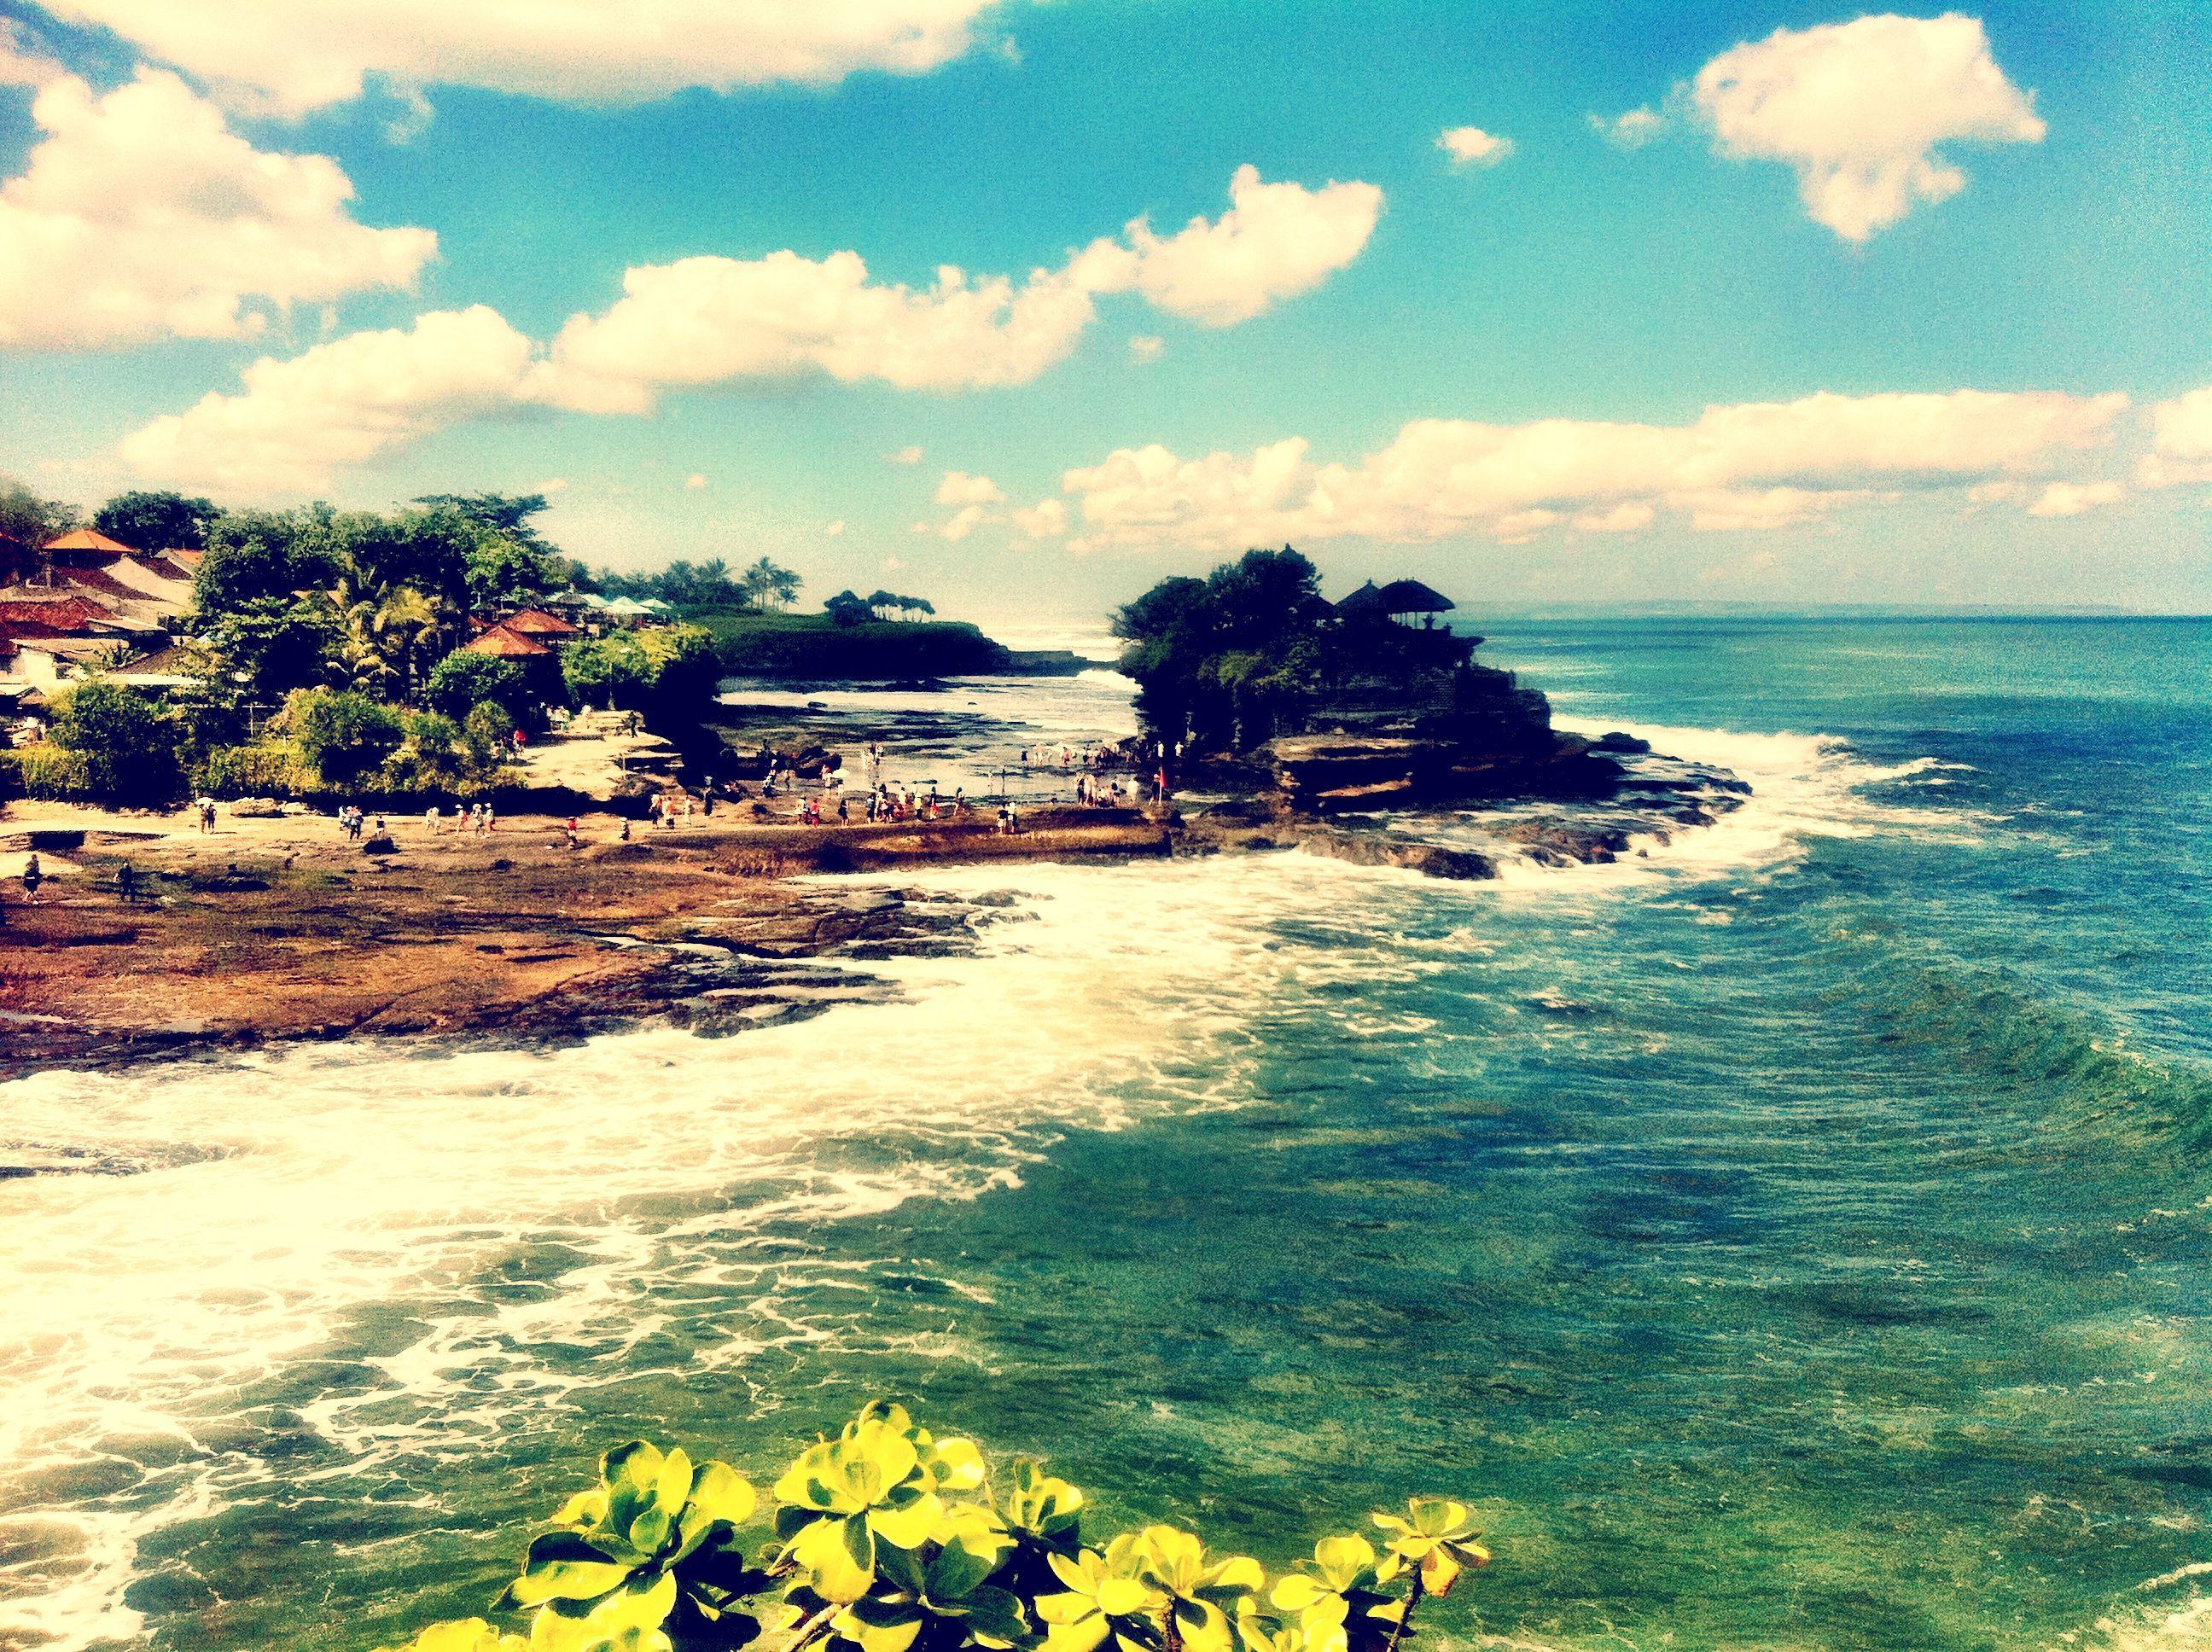 Bali Desktop Wallpapers - Top Free Bali Desktop Backgrounds